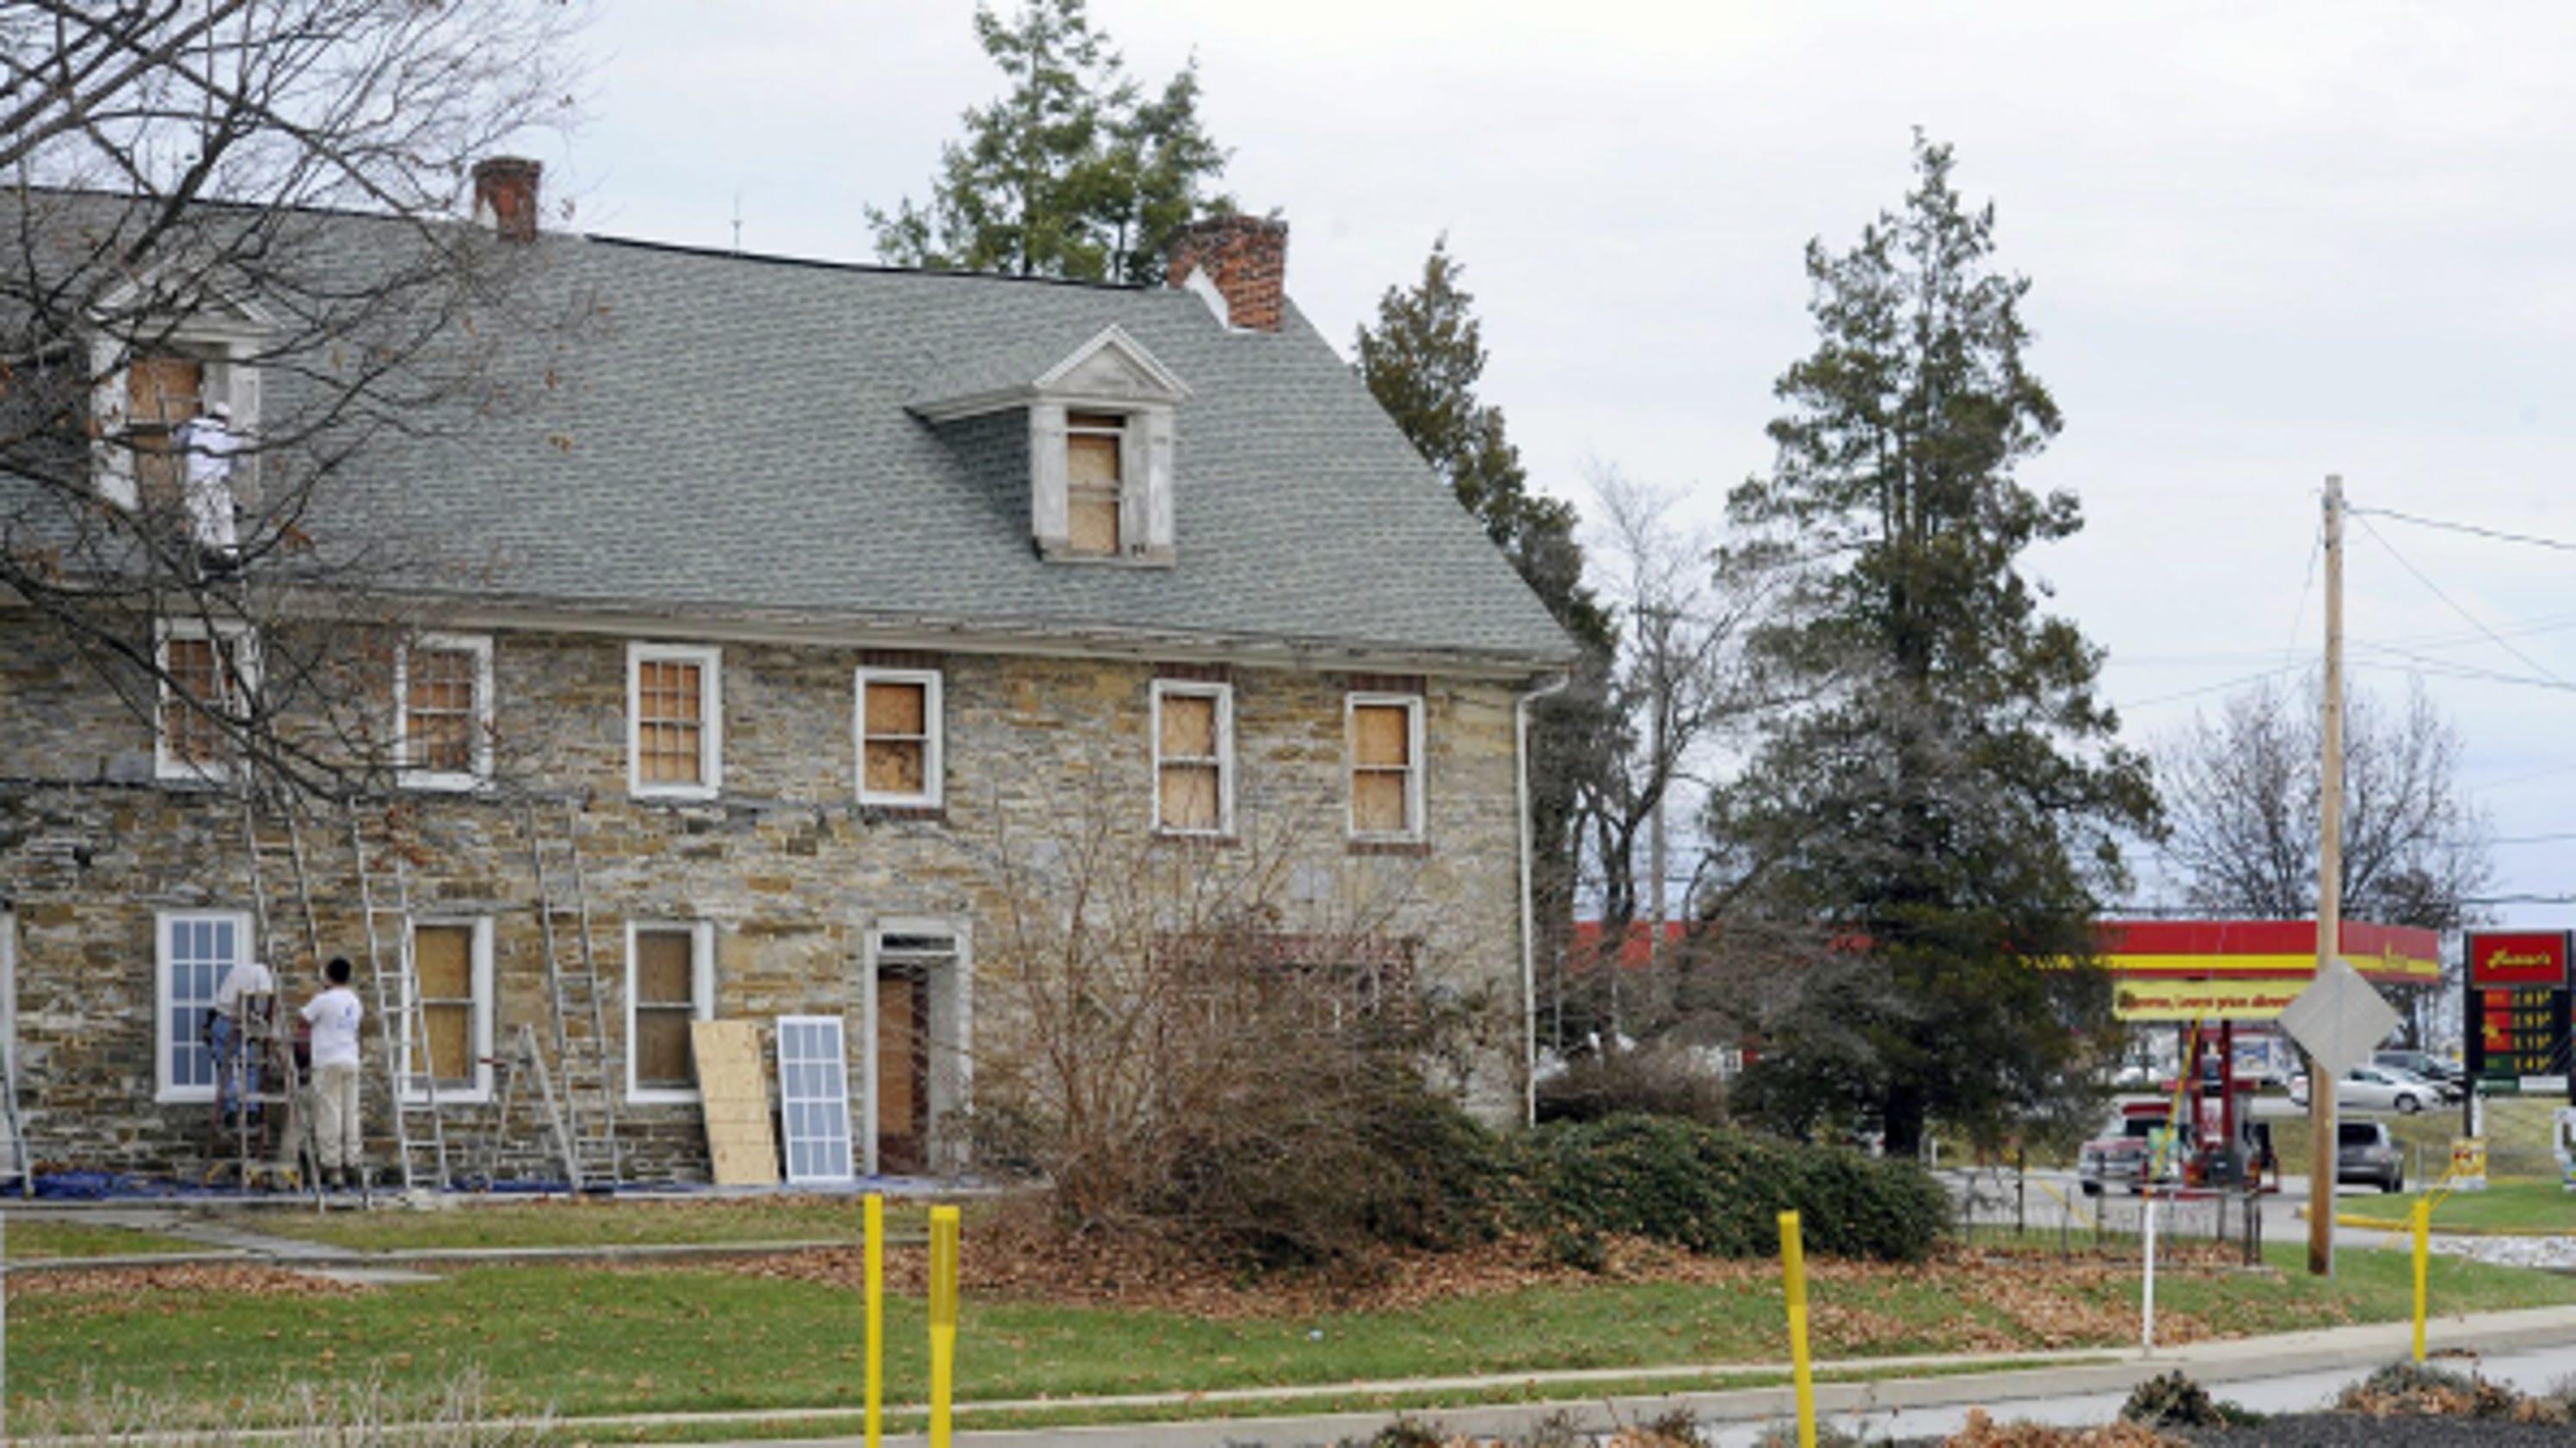 The Hoke House Spring Grove S Hoke House Saved For Now